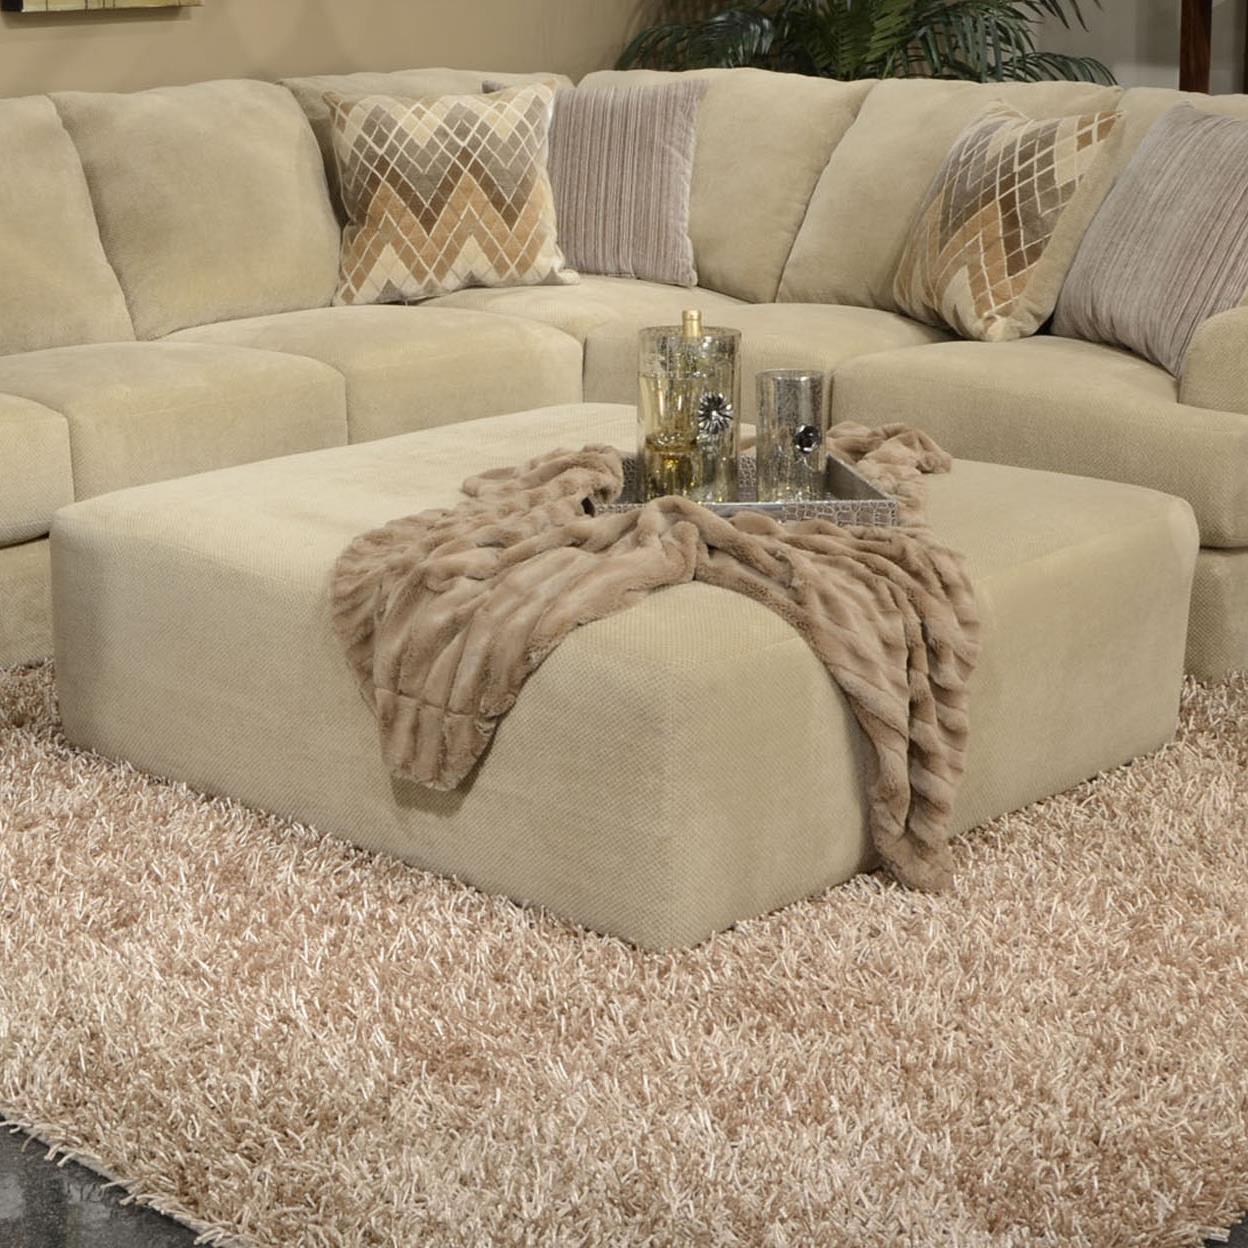 Jackson Furniture Malibu Cocktail Ottoman - Item Number: 3239-28-Sand